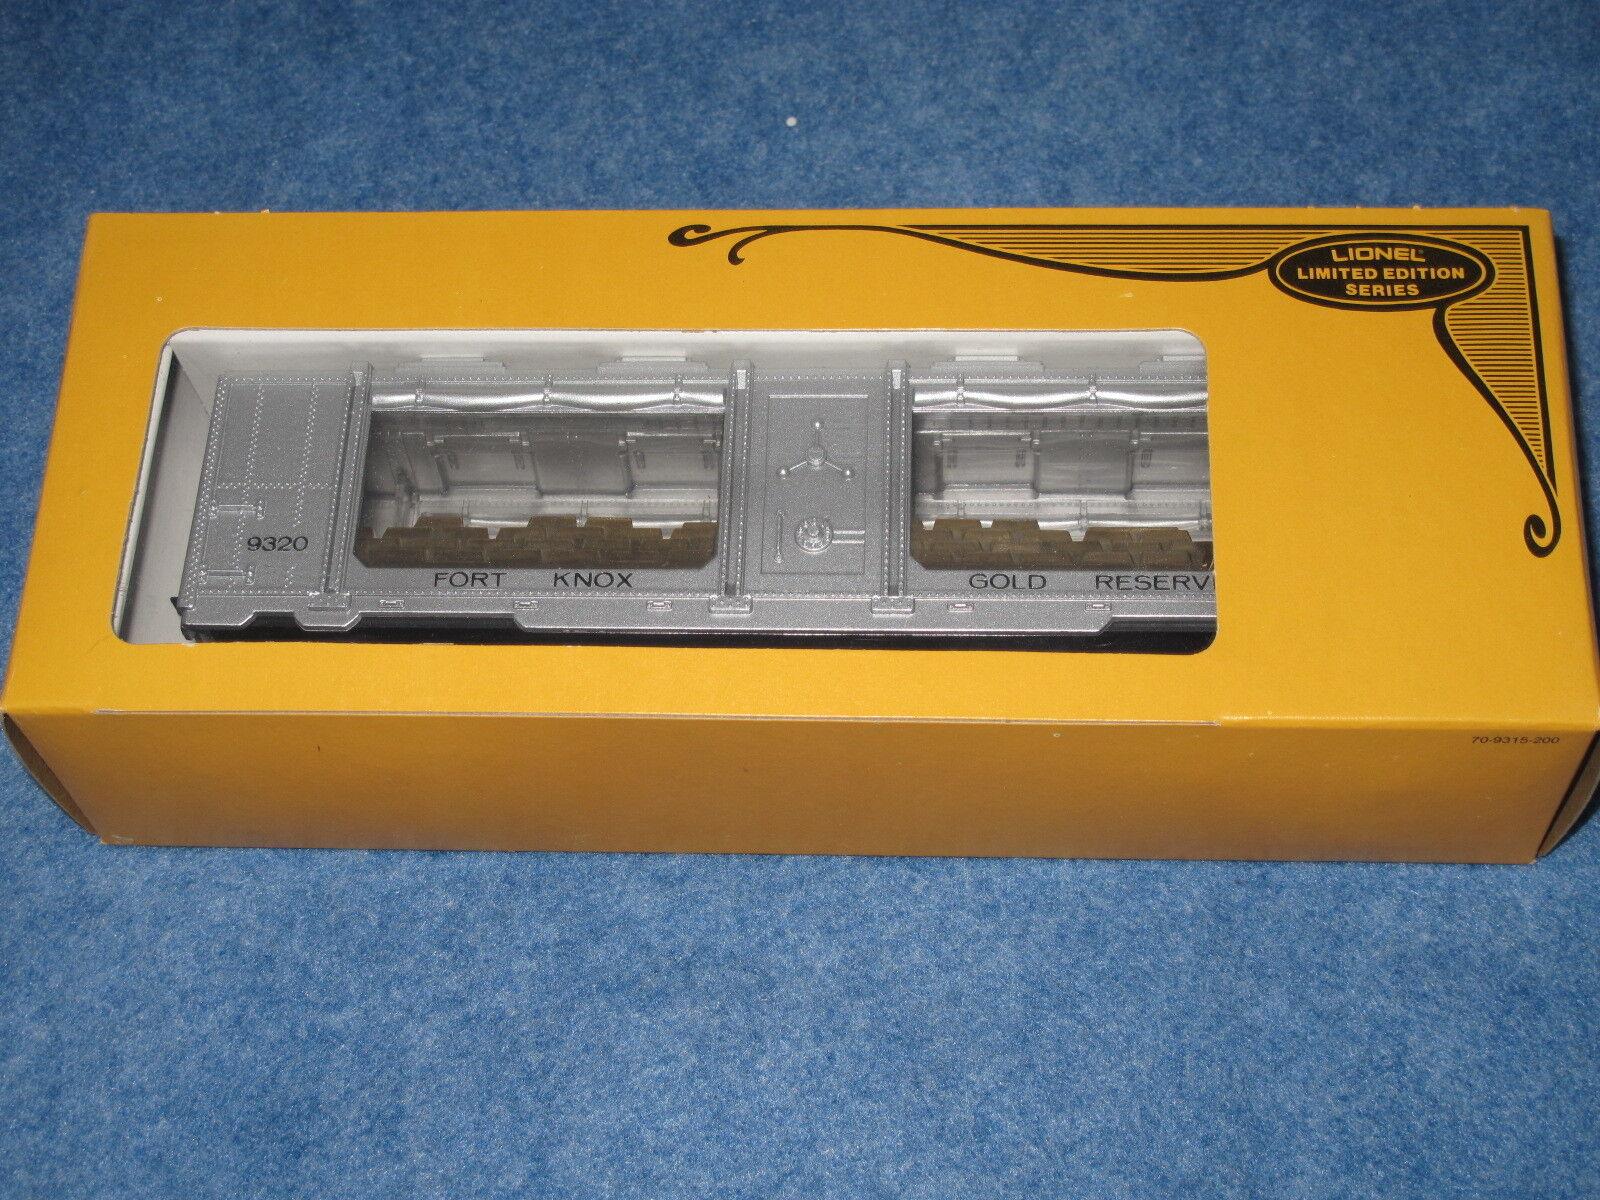 1979 Lionel 6-9320 Fort Knox lingotes de oro COCHE L2501 Nuevo En Caja